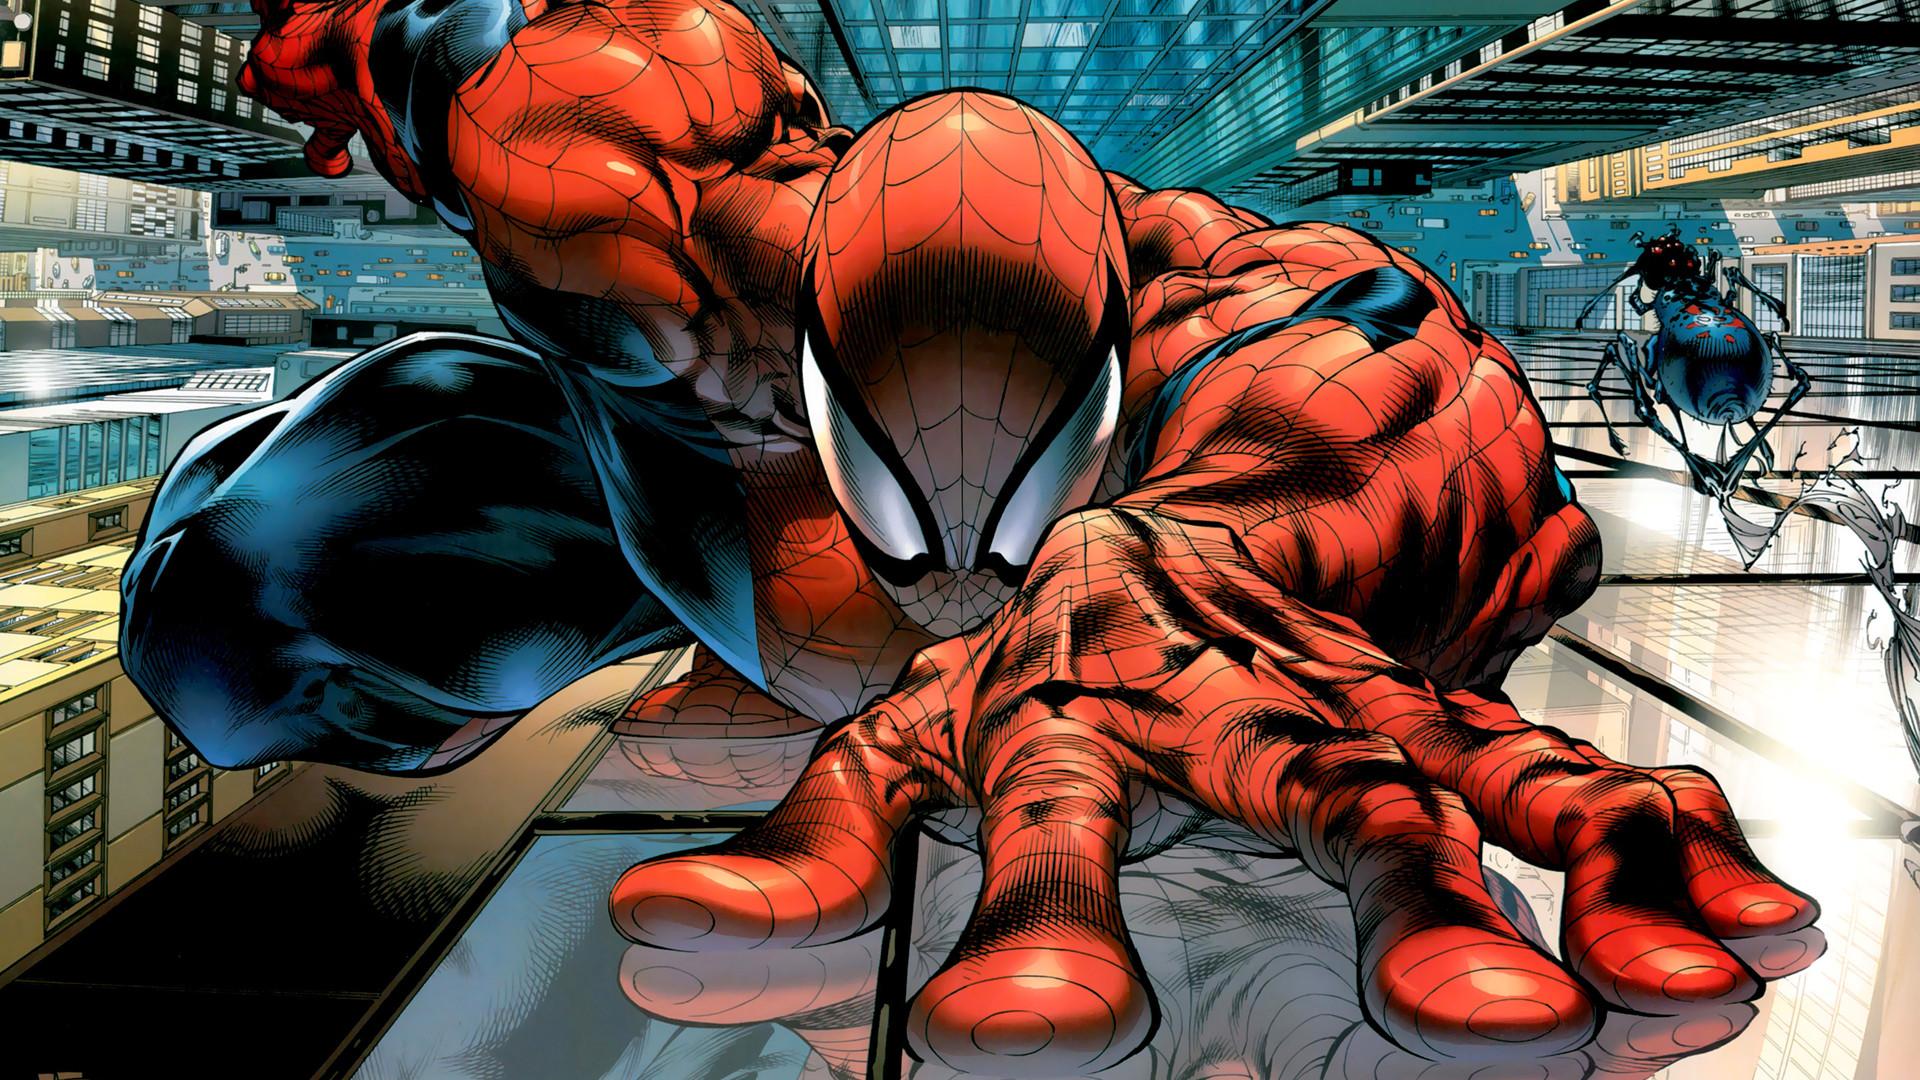 Spider man - 90s Cartoons